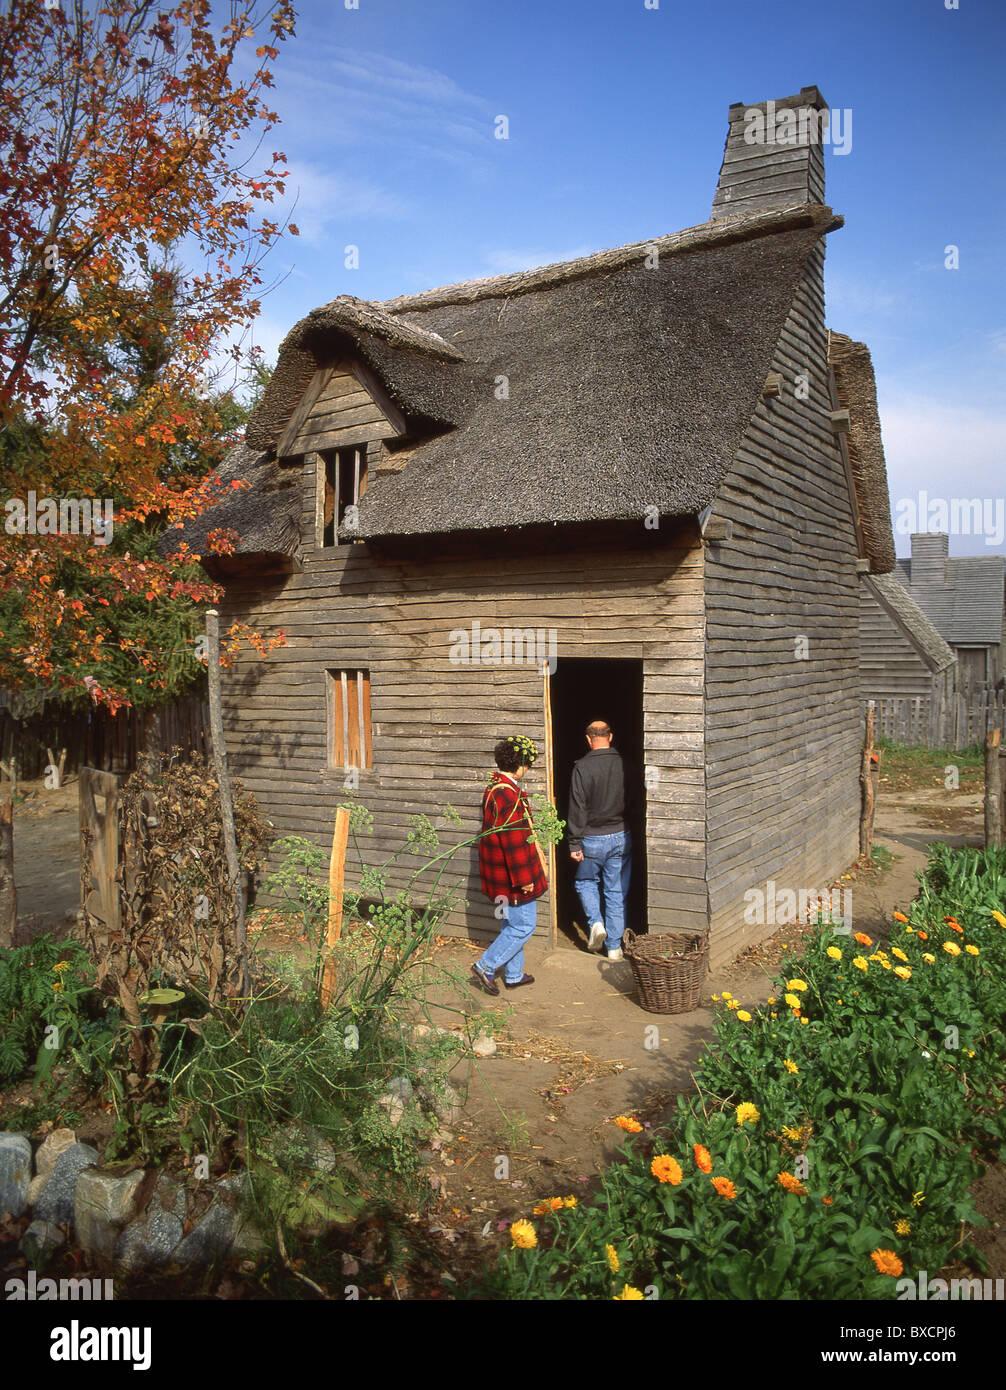 pilgrim house plymouth